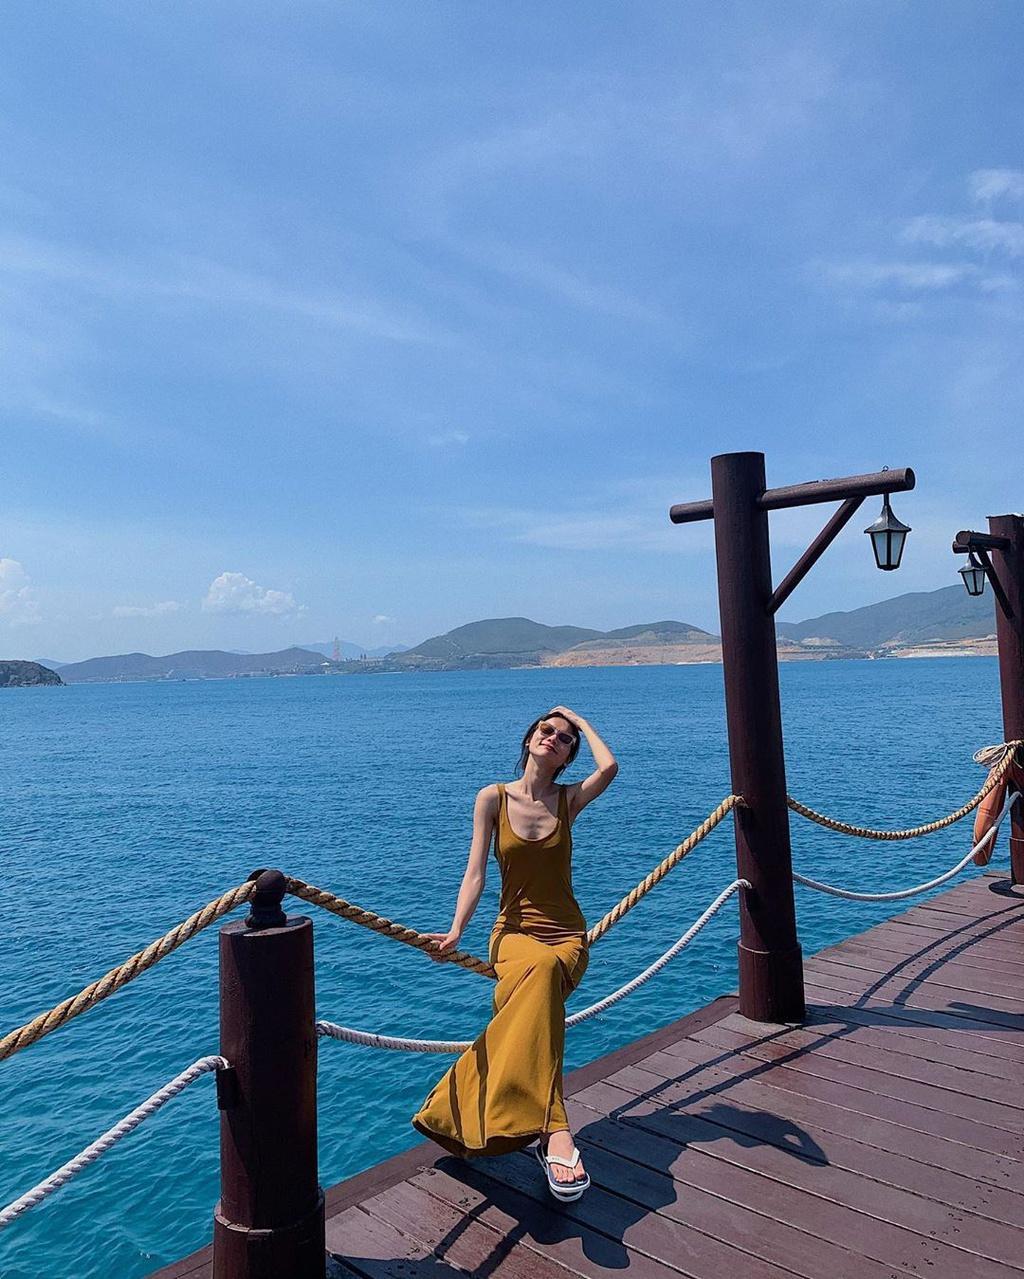 alluring wooden bridges amidst blue sea in vietnams famous tourism hub